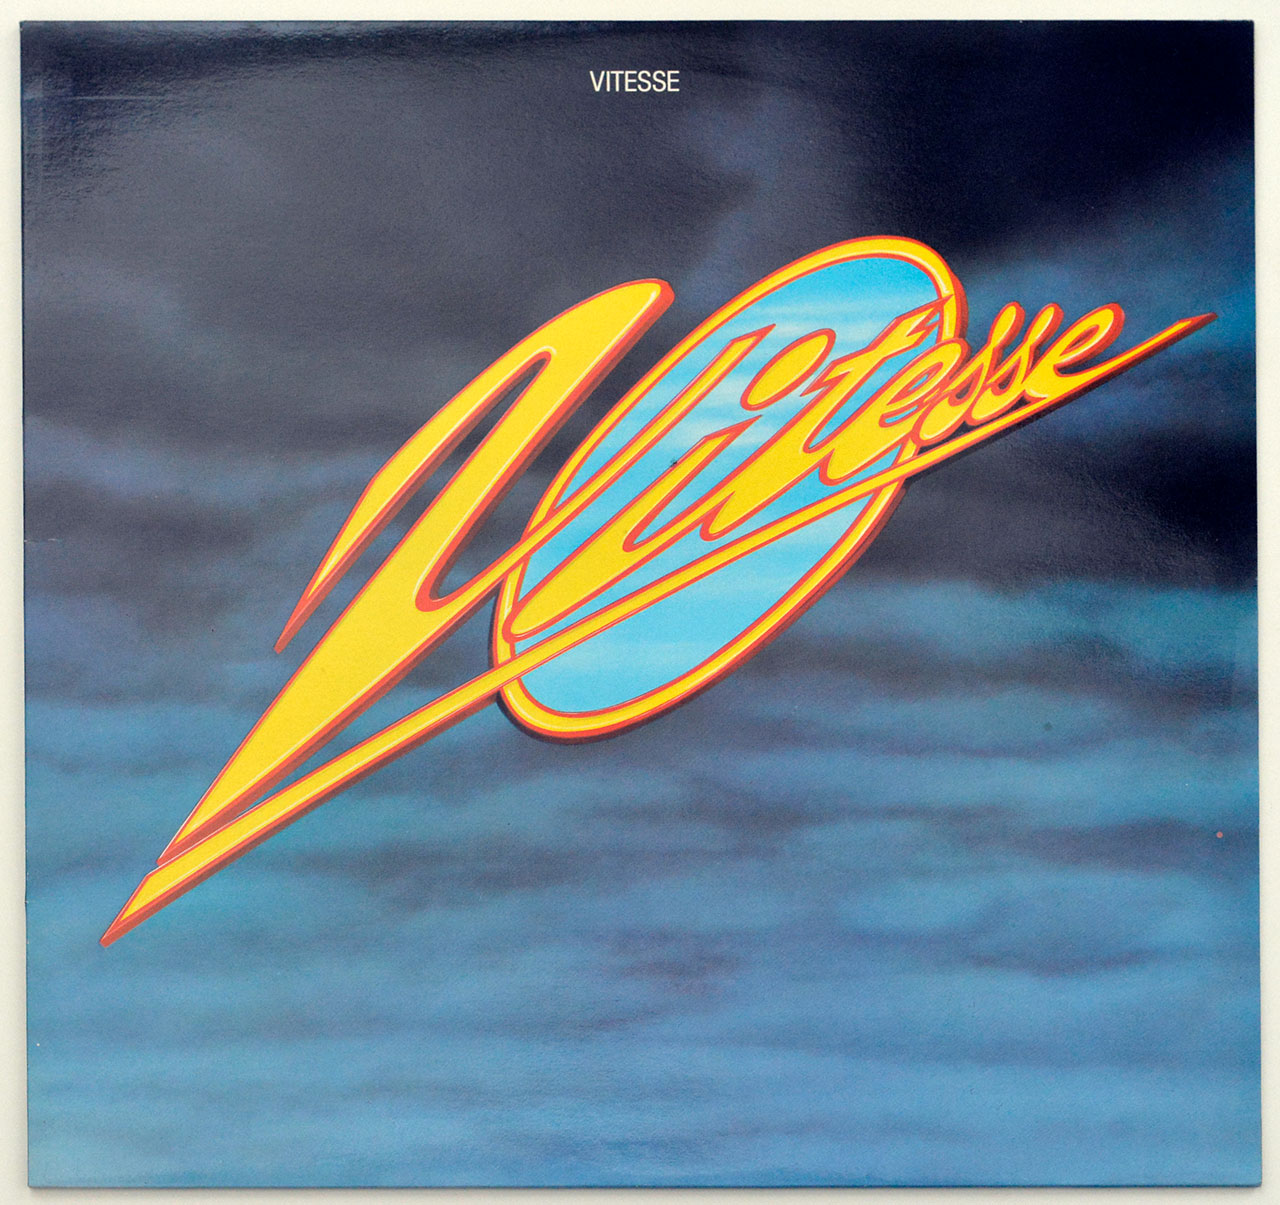 A0708 VITESSE Vitesse (Compilation)